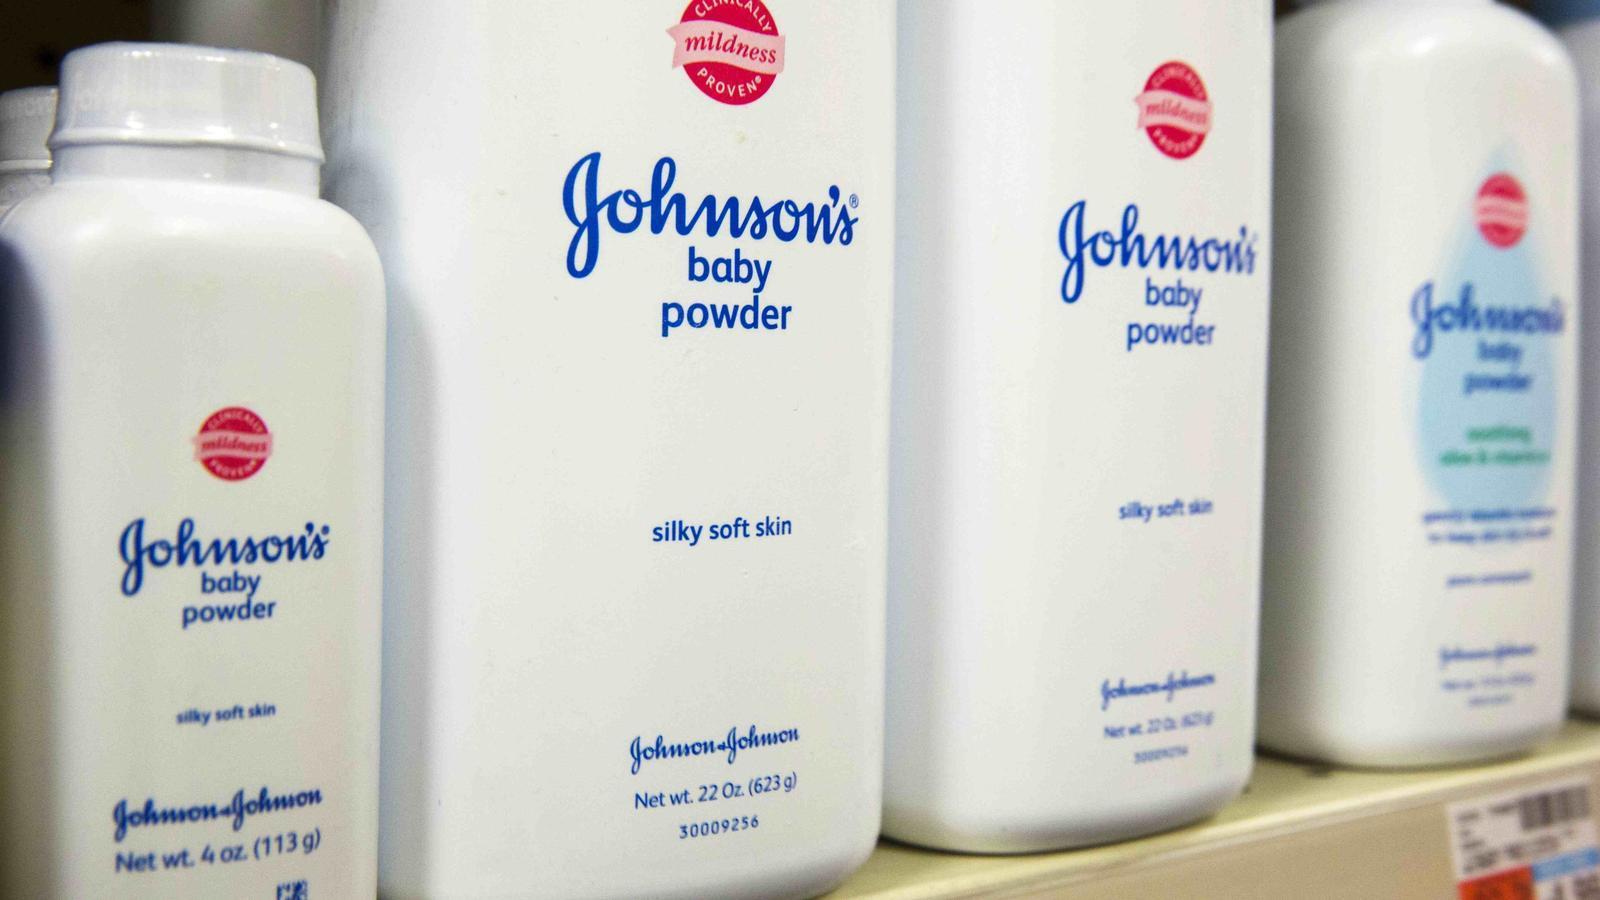 Multa milionària a Johnson & Johnson després que vinculin les seves pólvores de talc a un cas de càncer